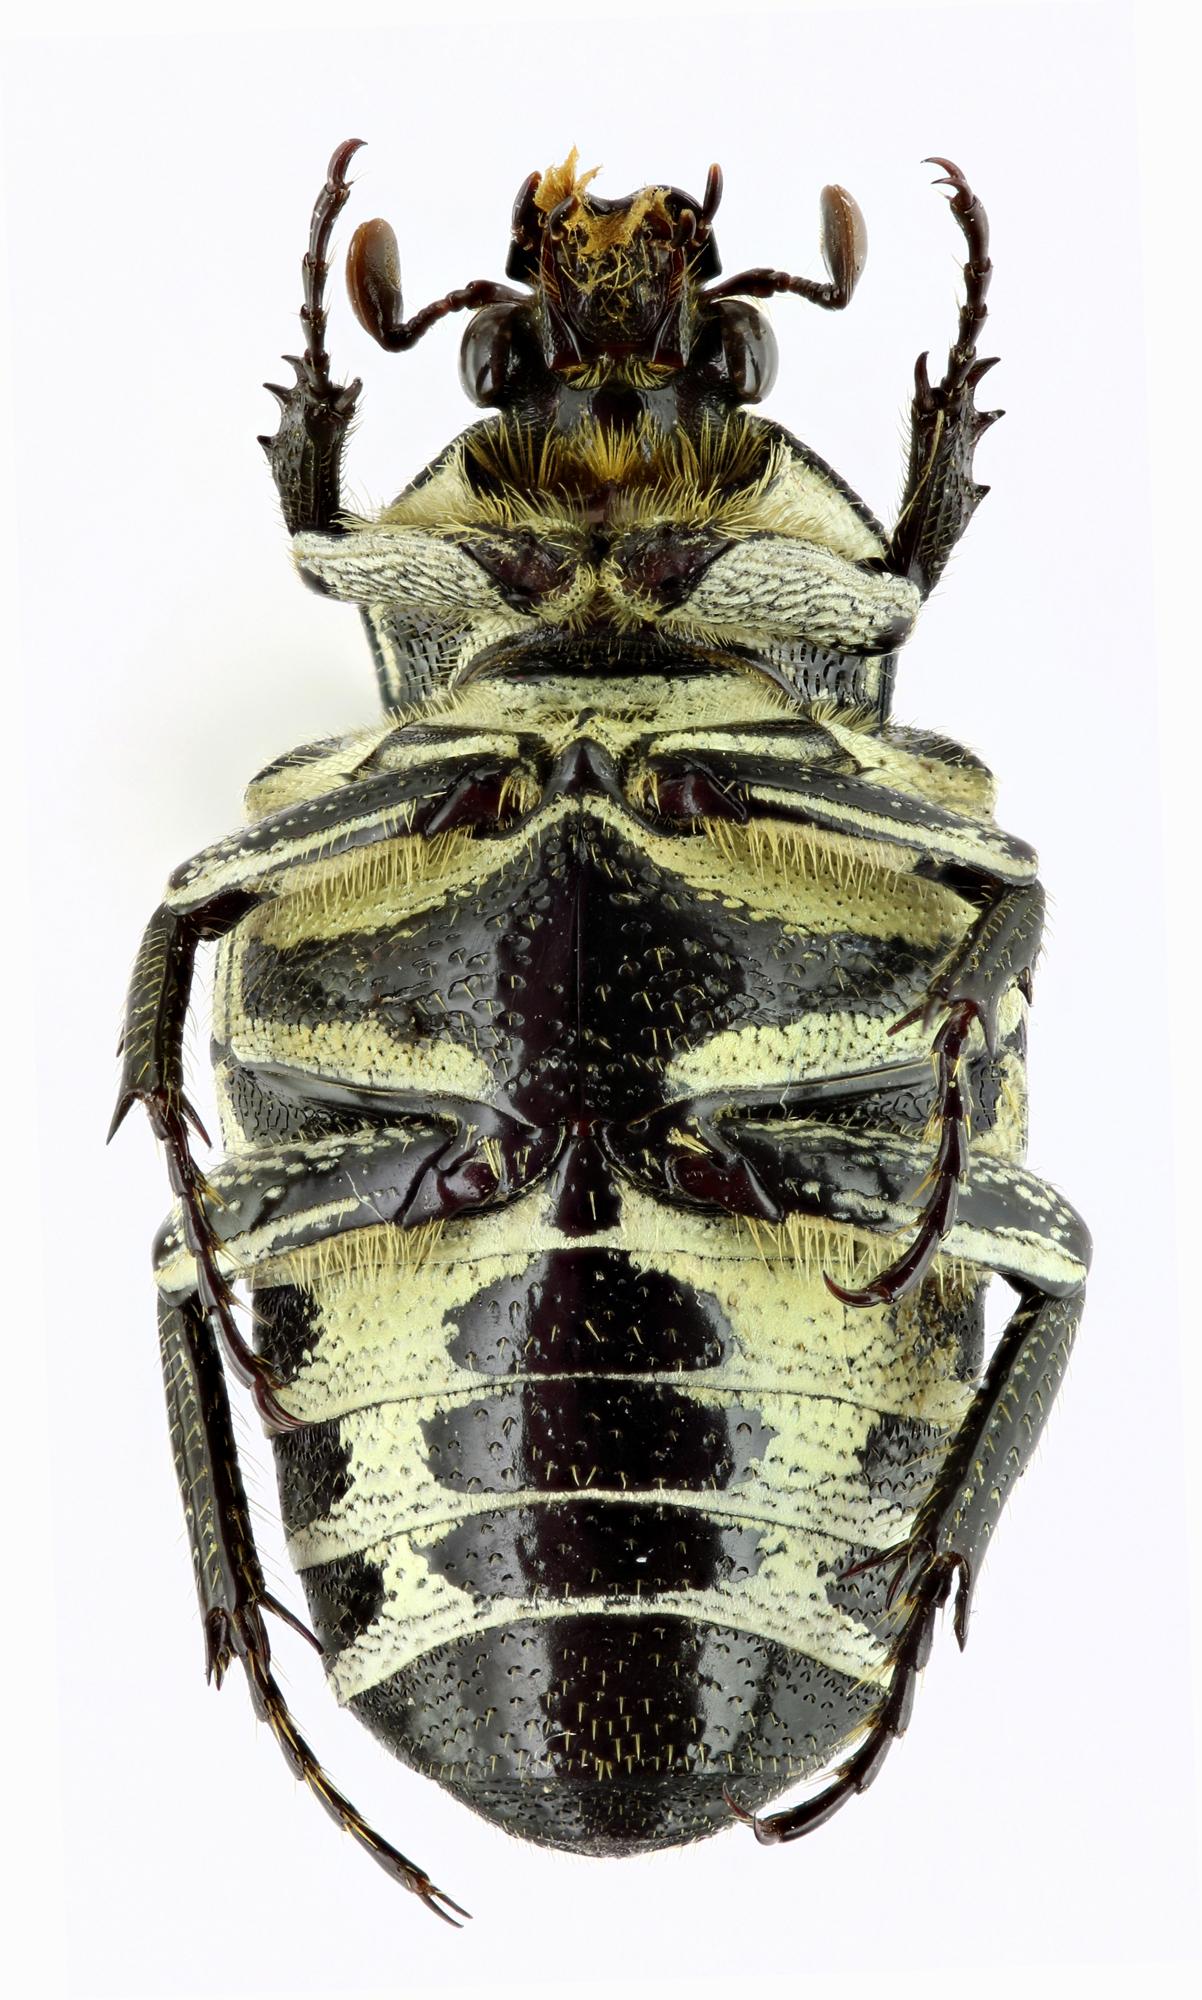 Taeniodera malabariensis 21682zs94.jpg